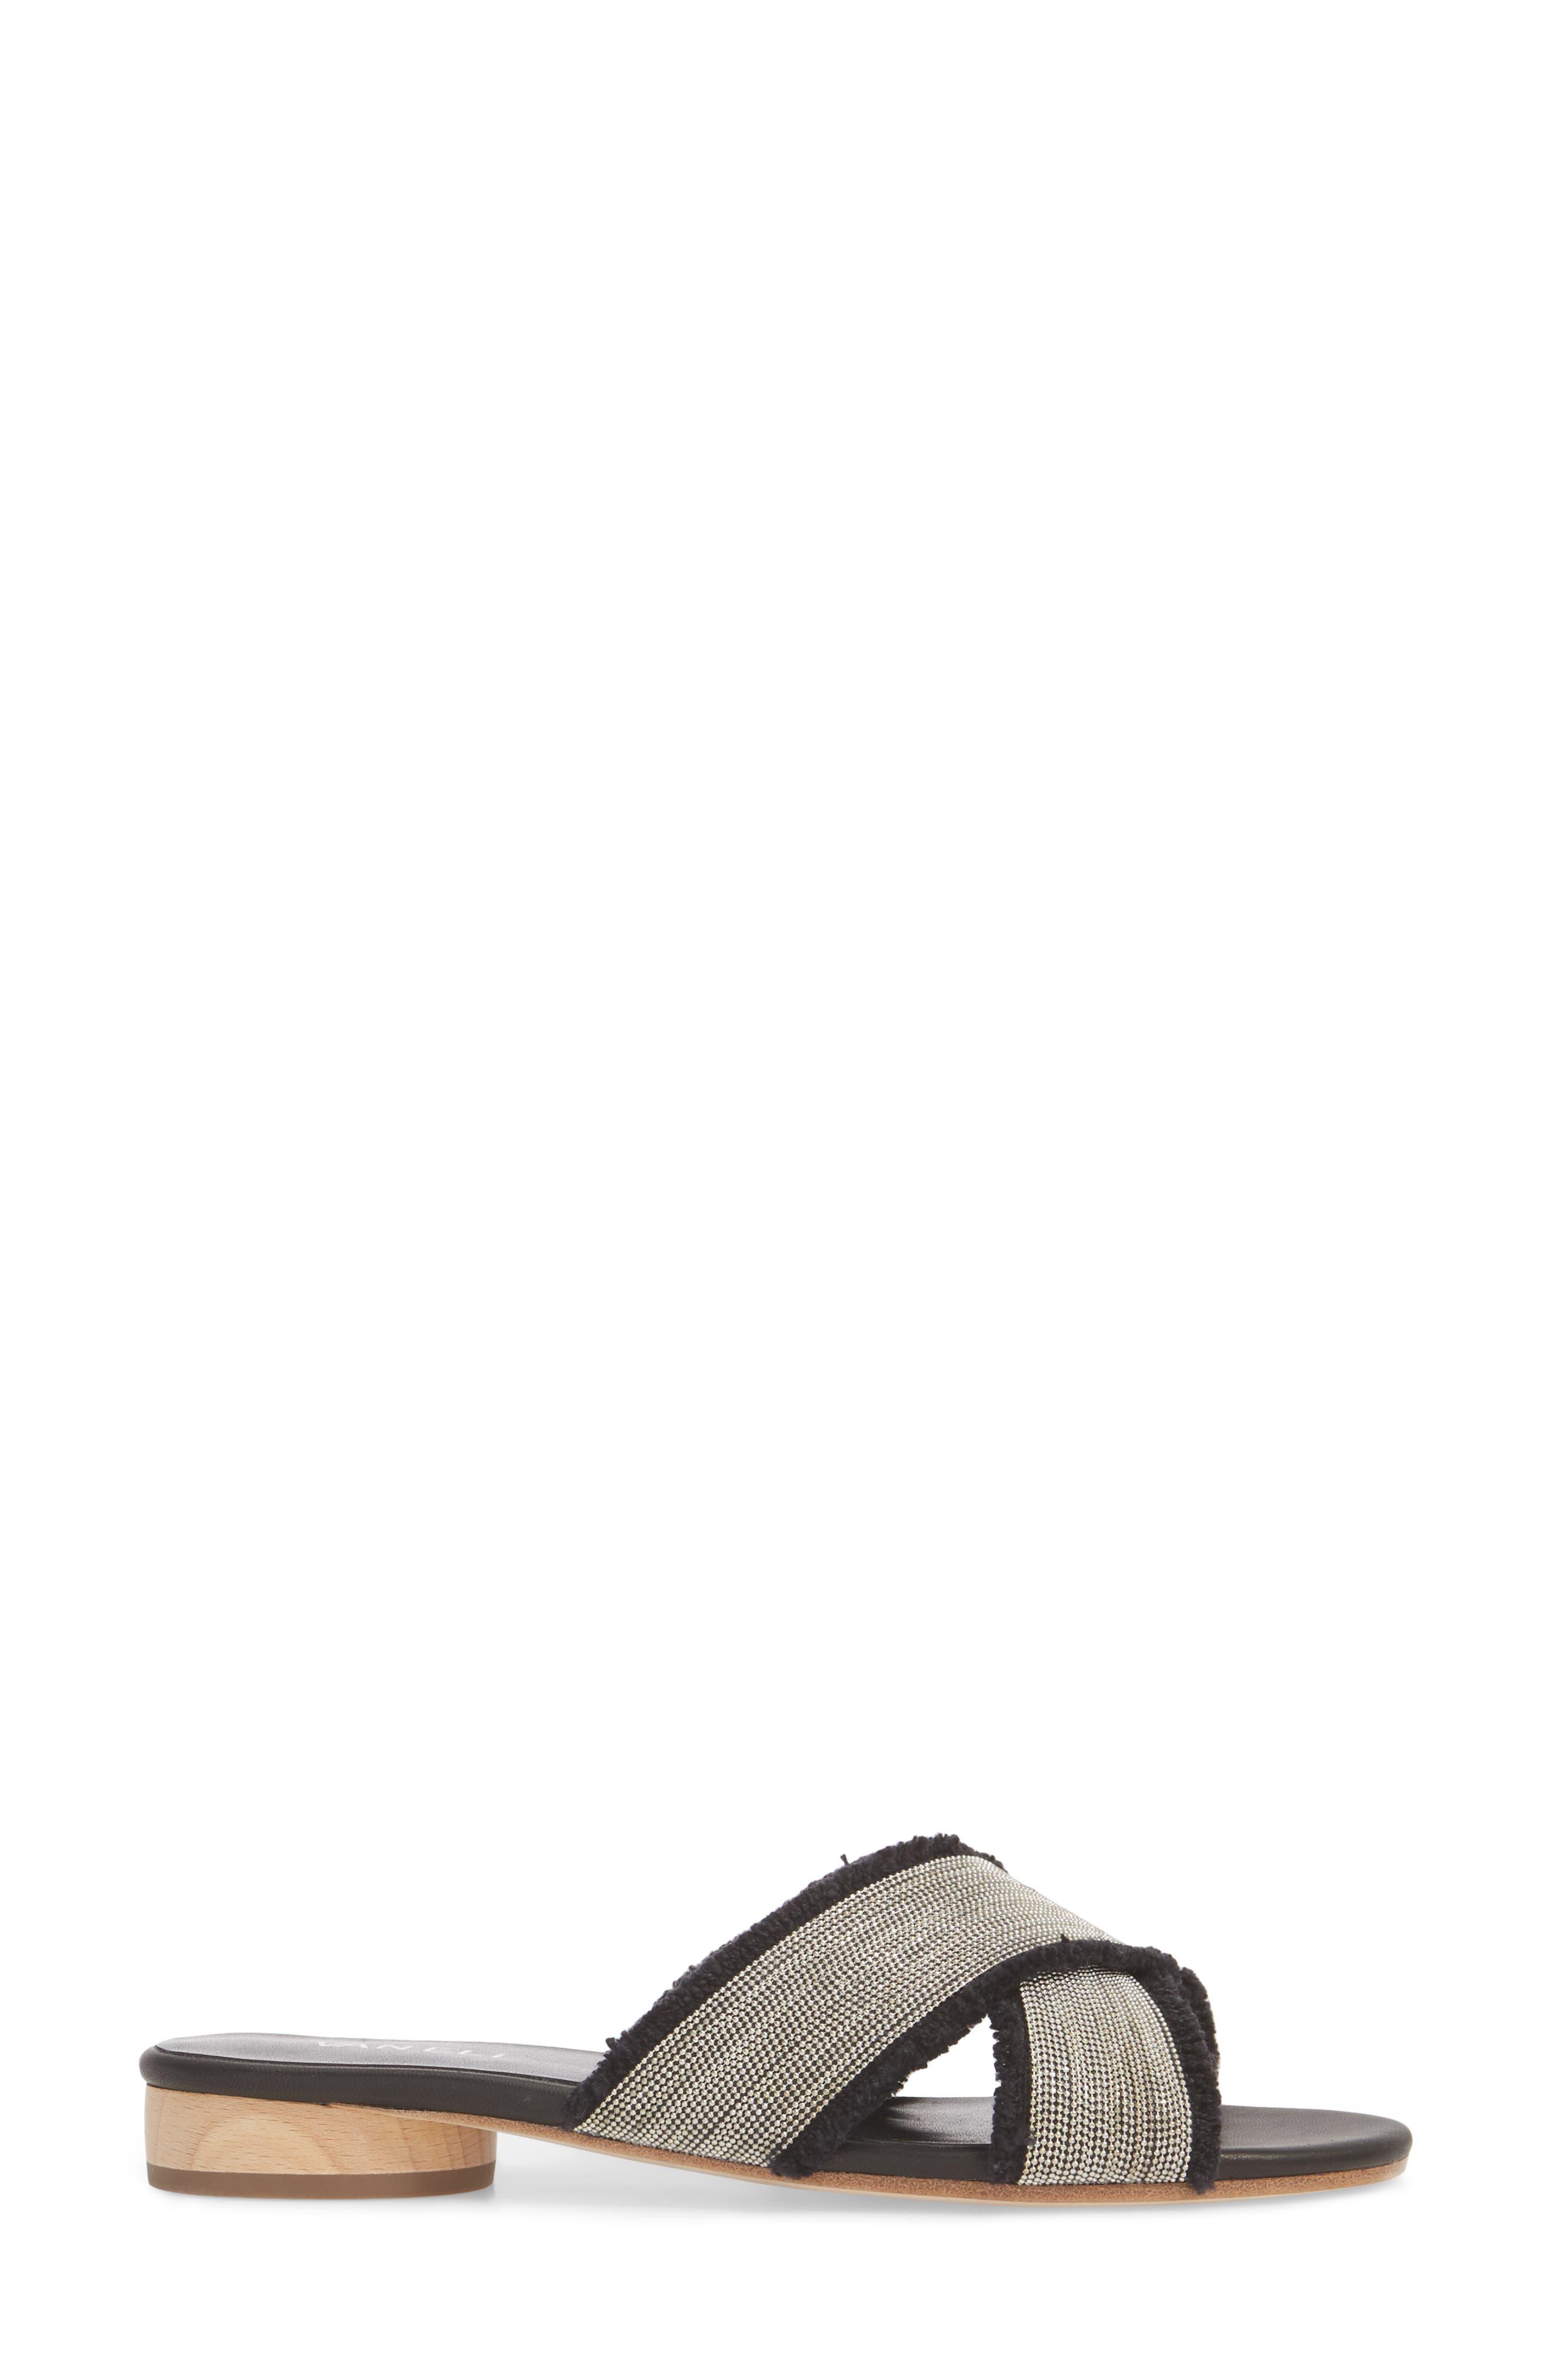 Baret Embellished Cross Strap Slide Sandal,                             Alternate thumbnail 3, color,                             BLACK FABRIC